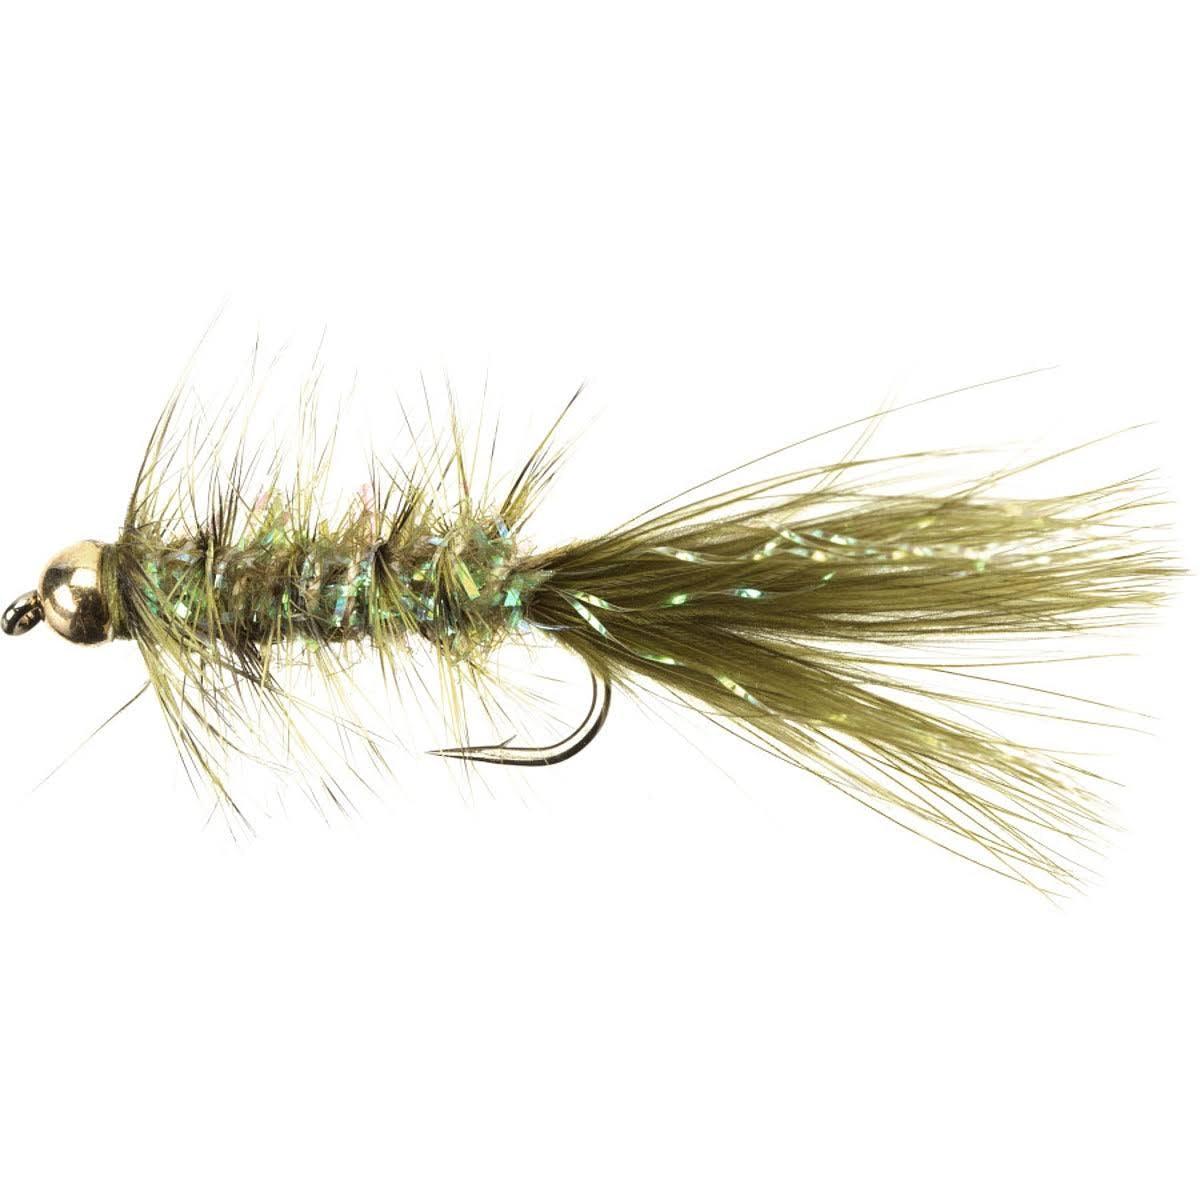 Umpqua Gold Bead Crystal Bugger - 2 - Pack Copper Brown, 8